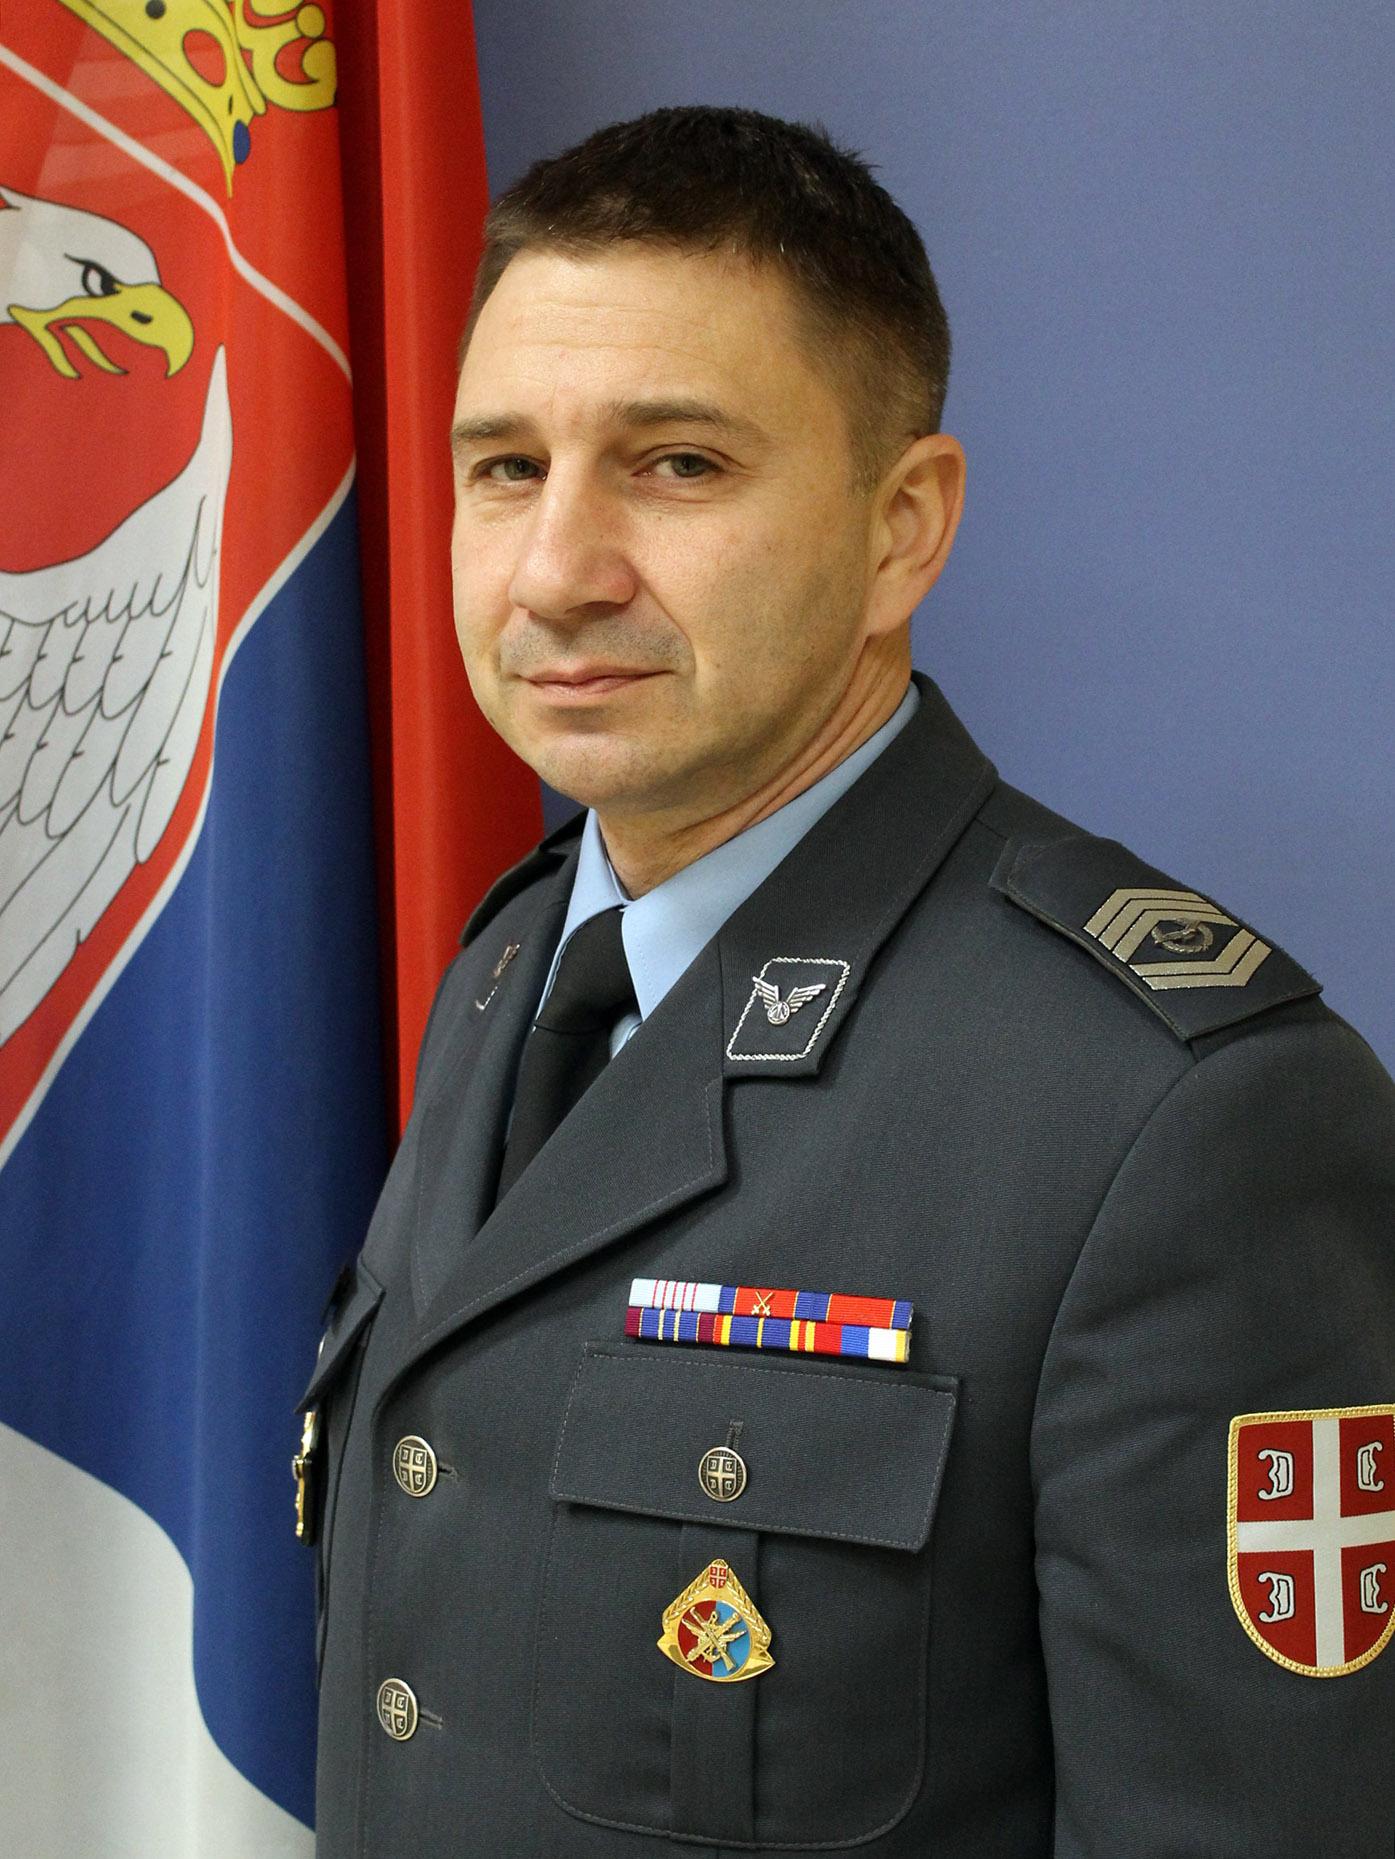 zastavnik prve klase Saša Sailović